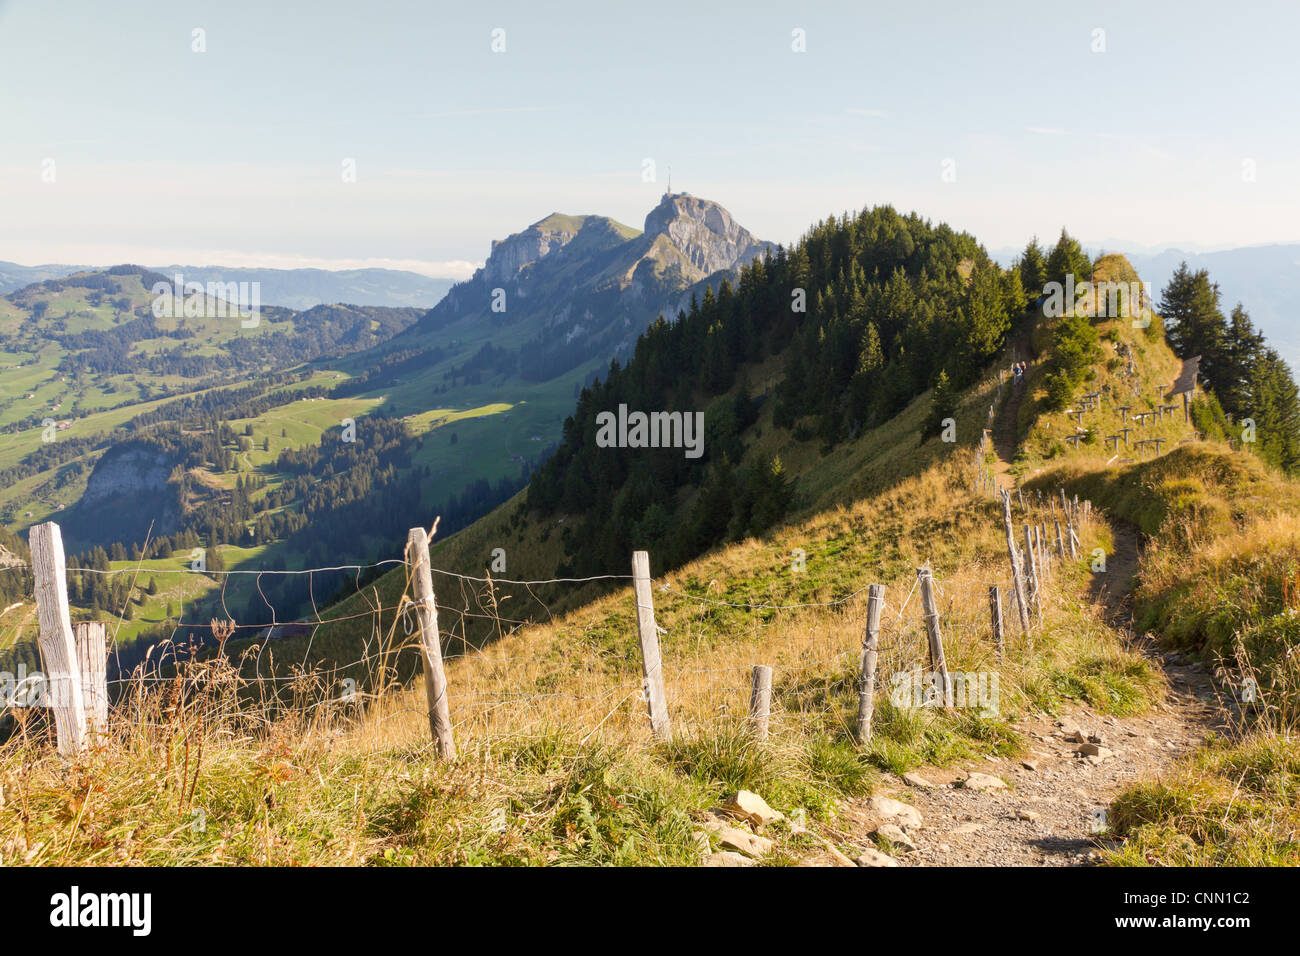 hiking path through rocky mountainous terrain with mountain Säntis in the distance - Stock Image